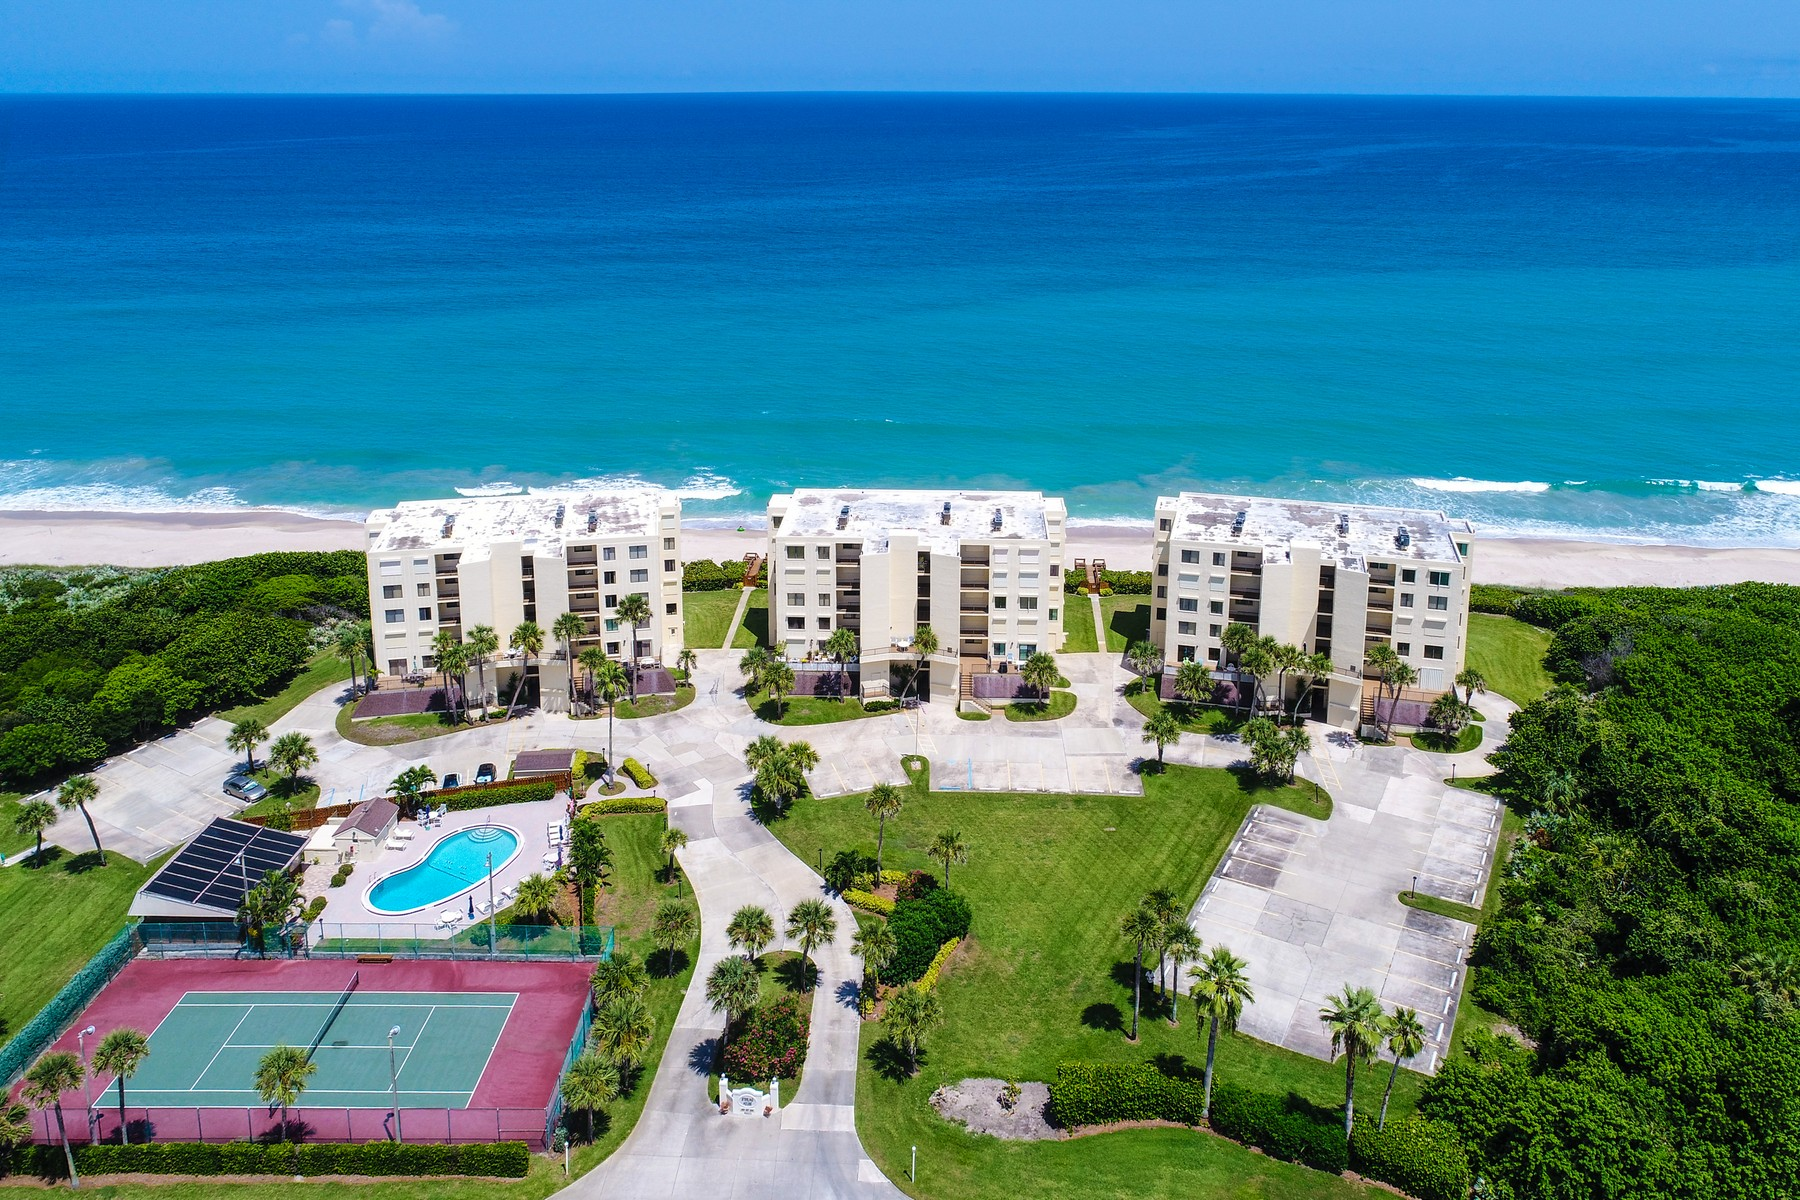 Sterling House of Melbourne Beach 6307 Highway A1A #263 Melbourne Beach, Florida 32951 États-Unis